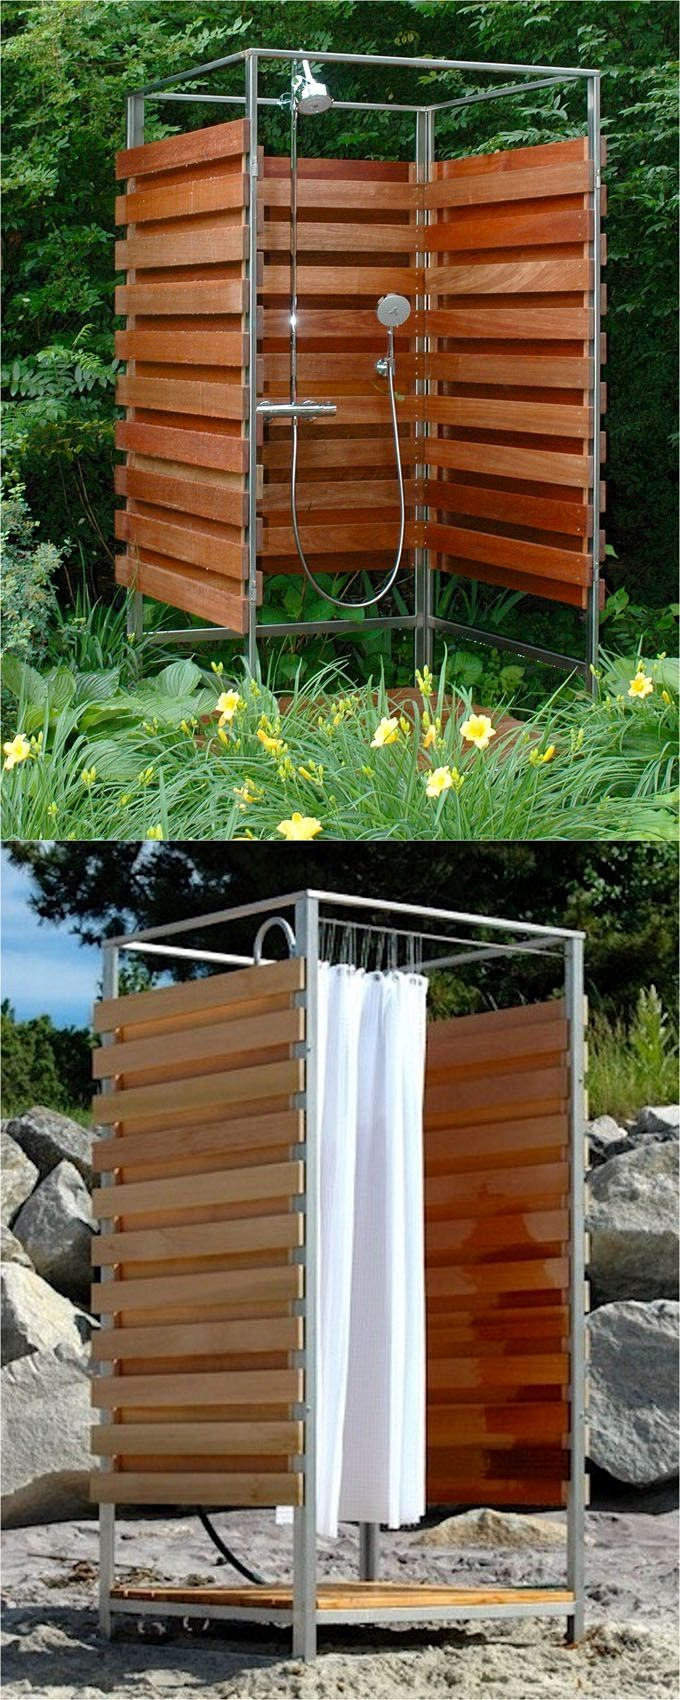 48 Fresh Outdoor Shower Ideas Letnij Dush Sadovye Idei Sadovyj Dush